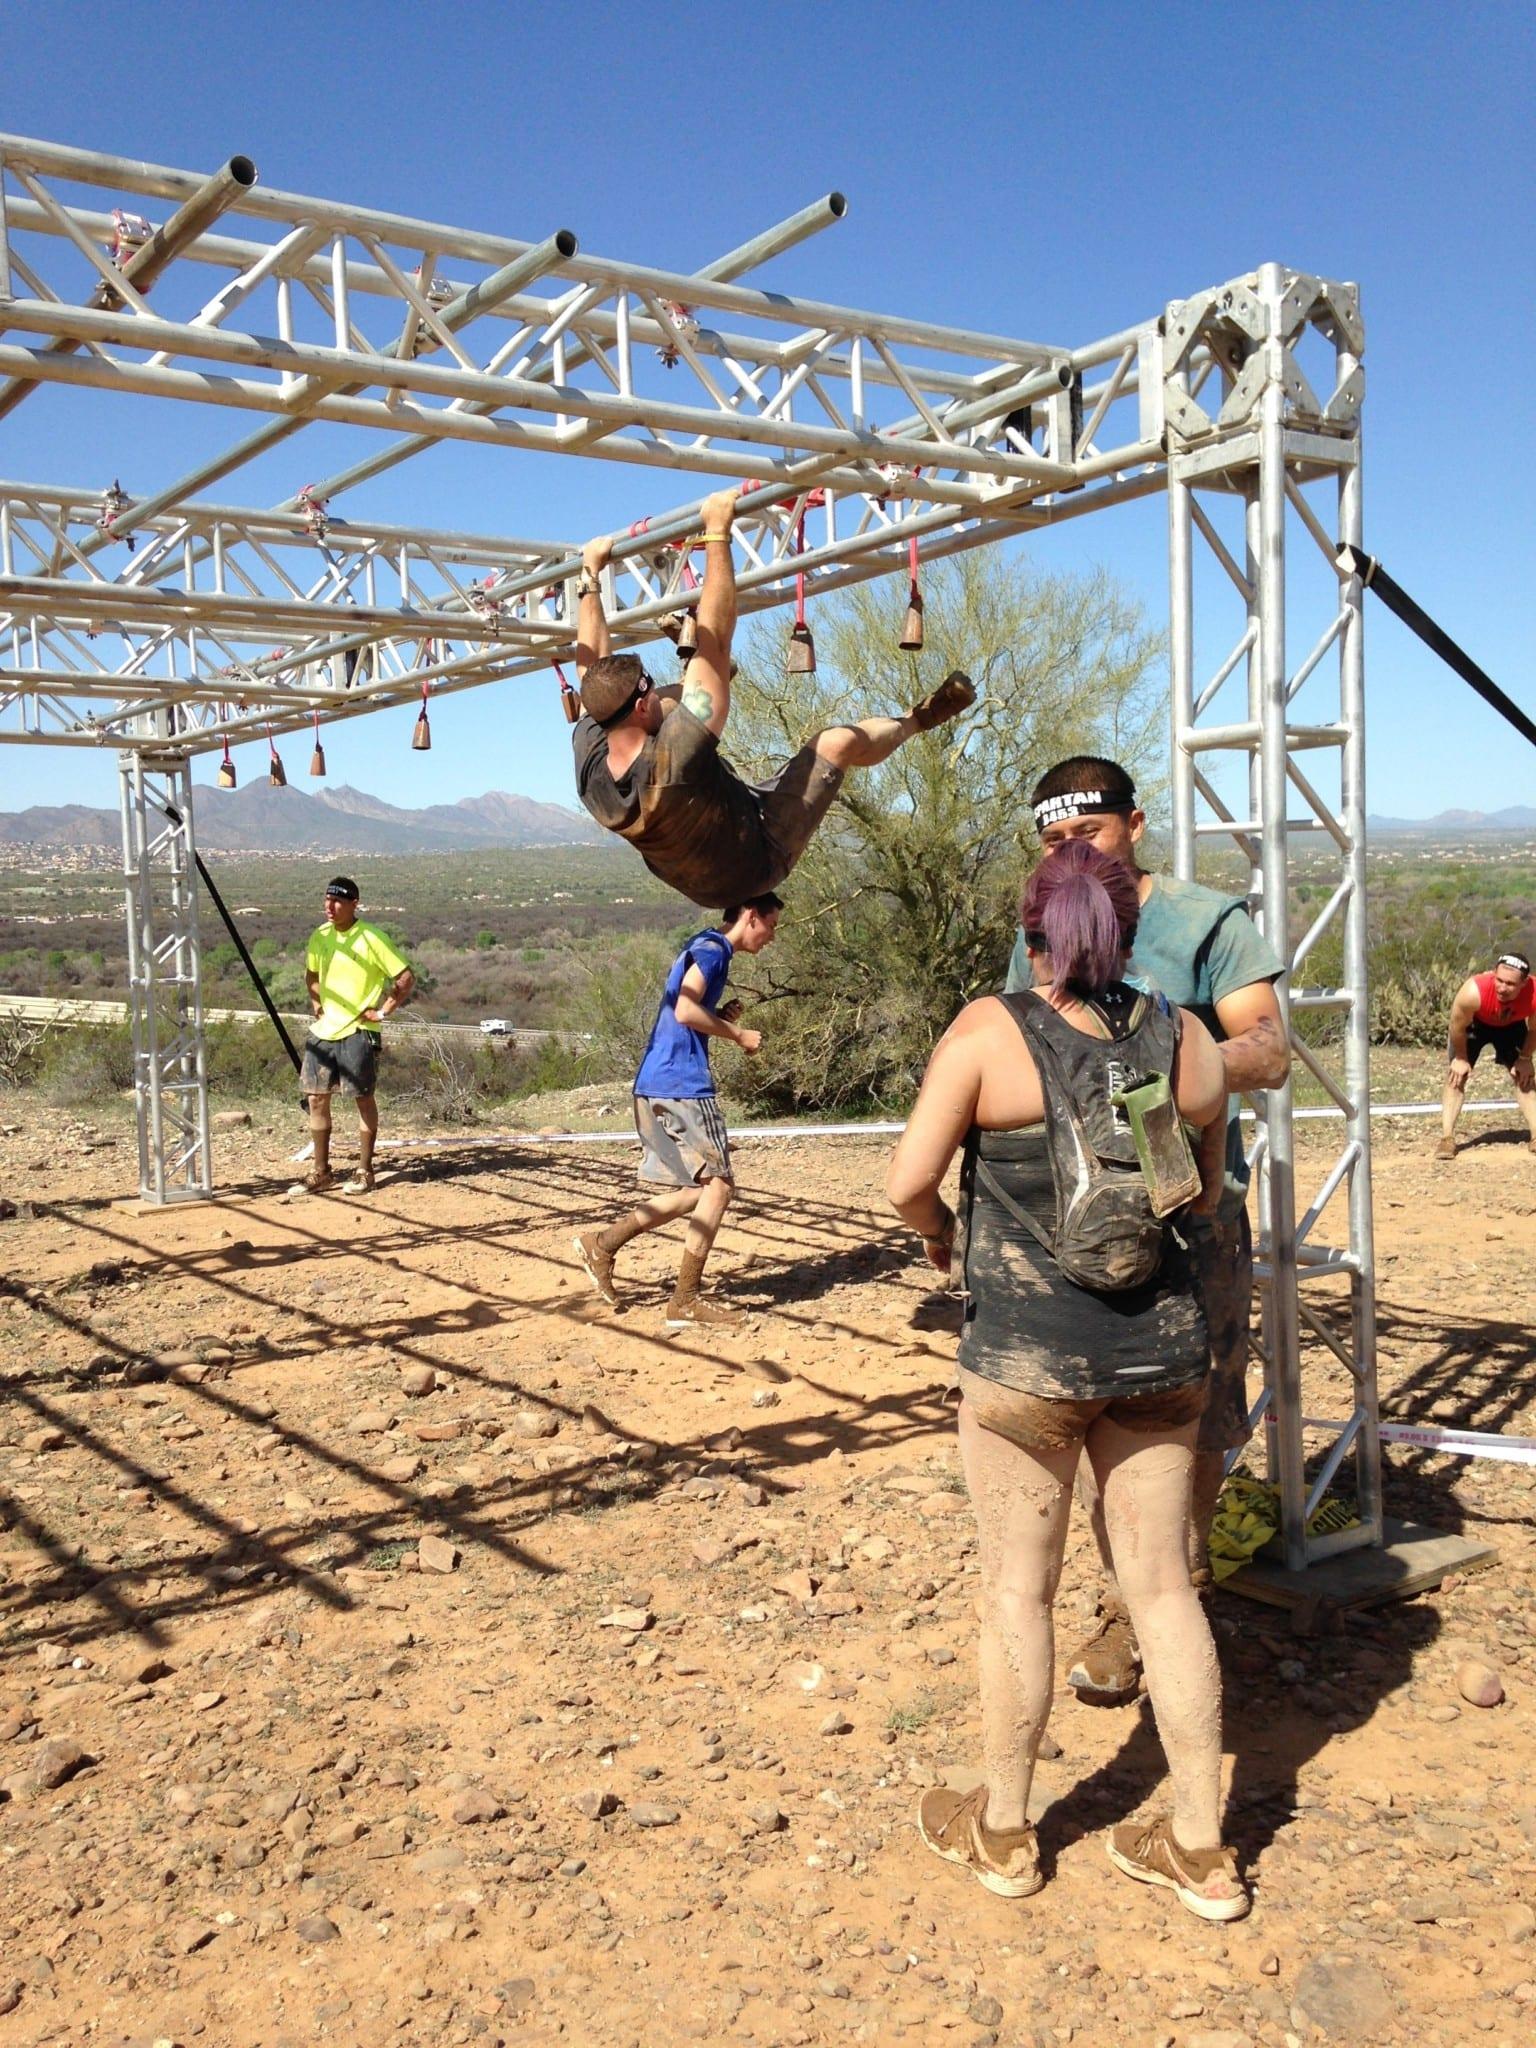 Arizona Spartan Monkey bars